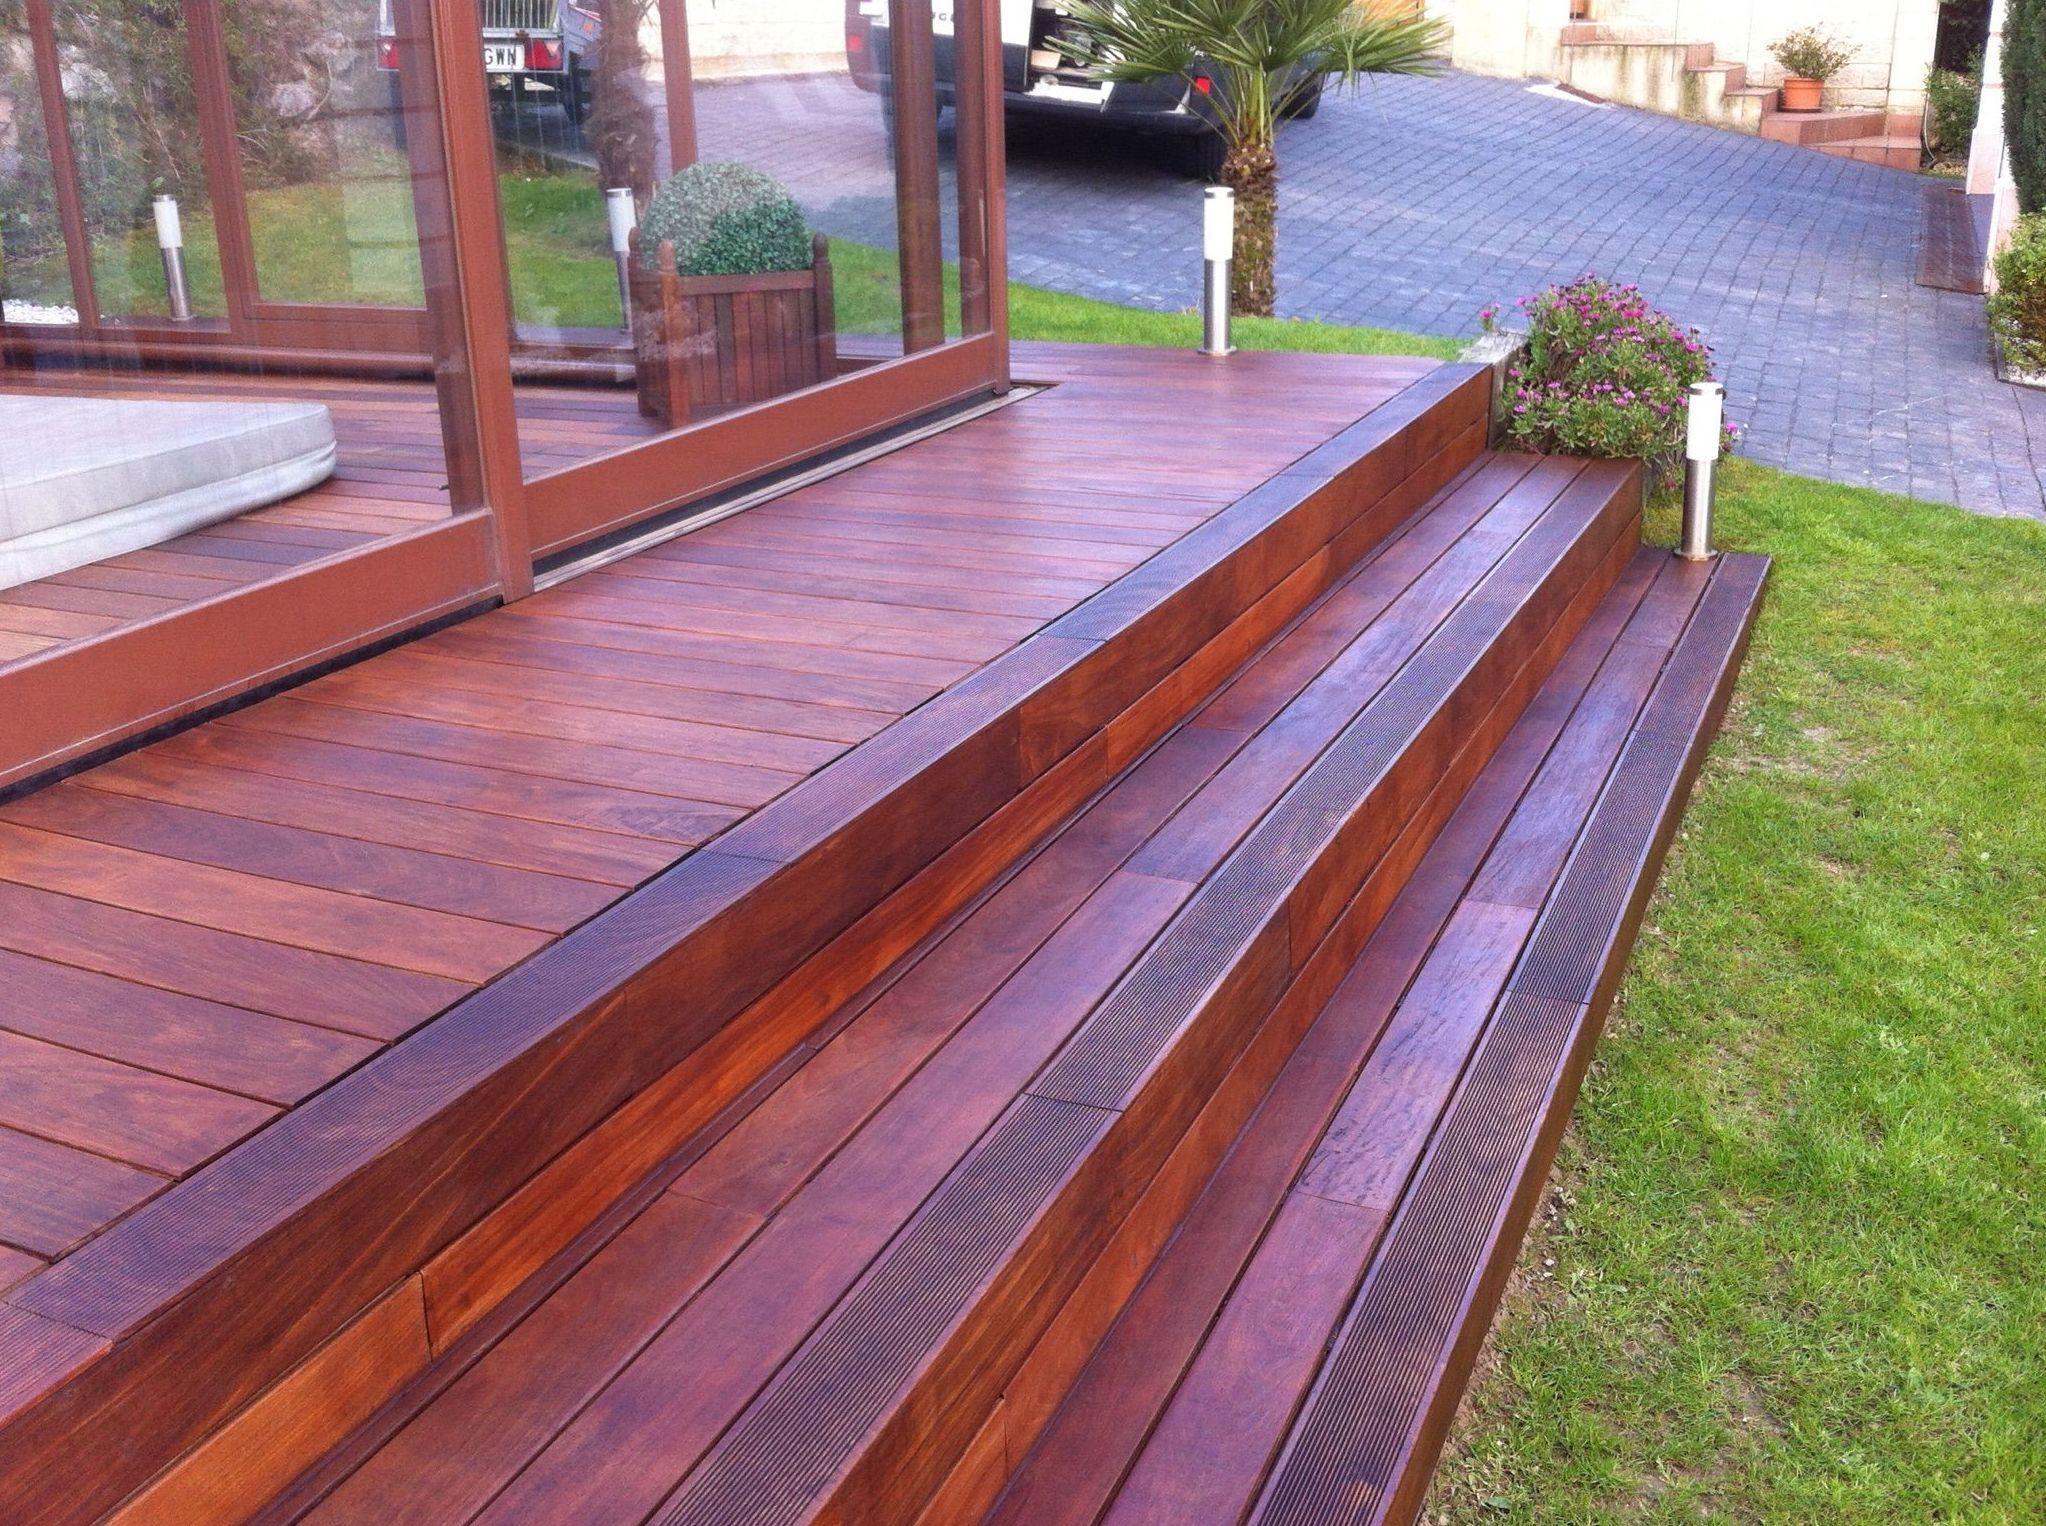 Suelos de madera para exterior